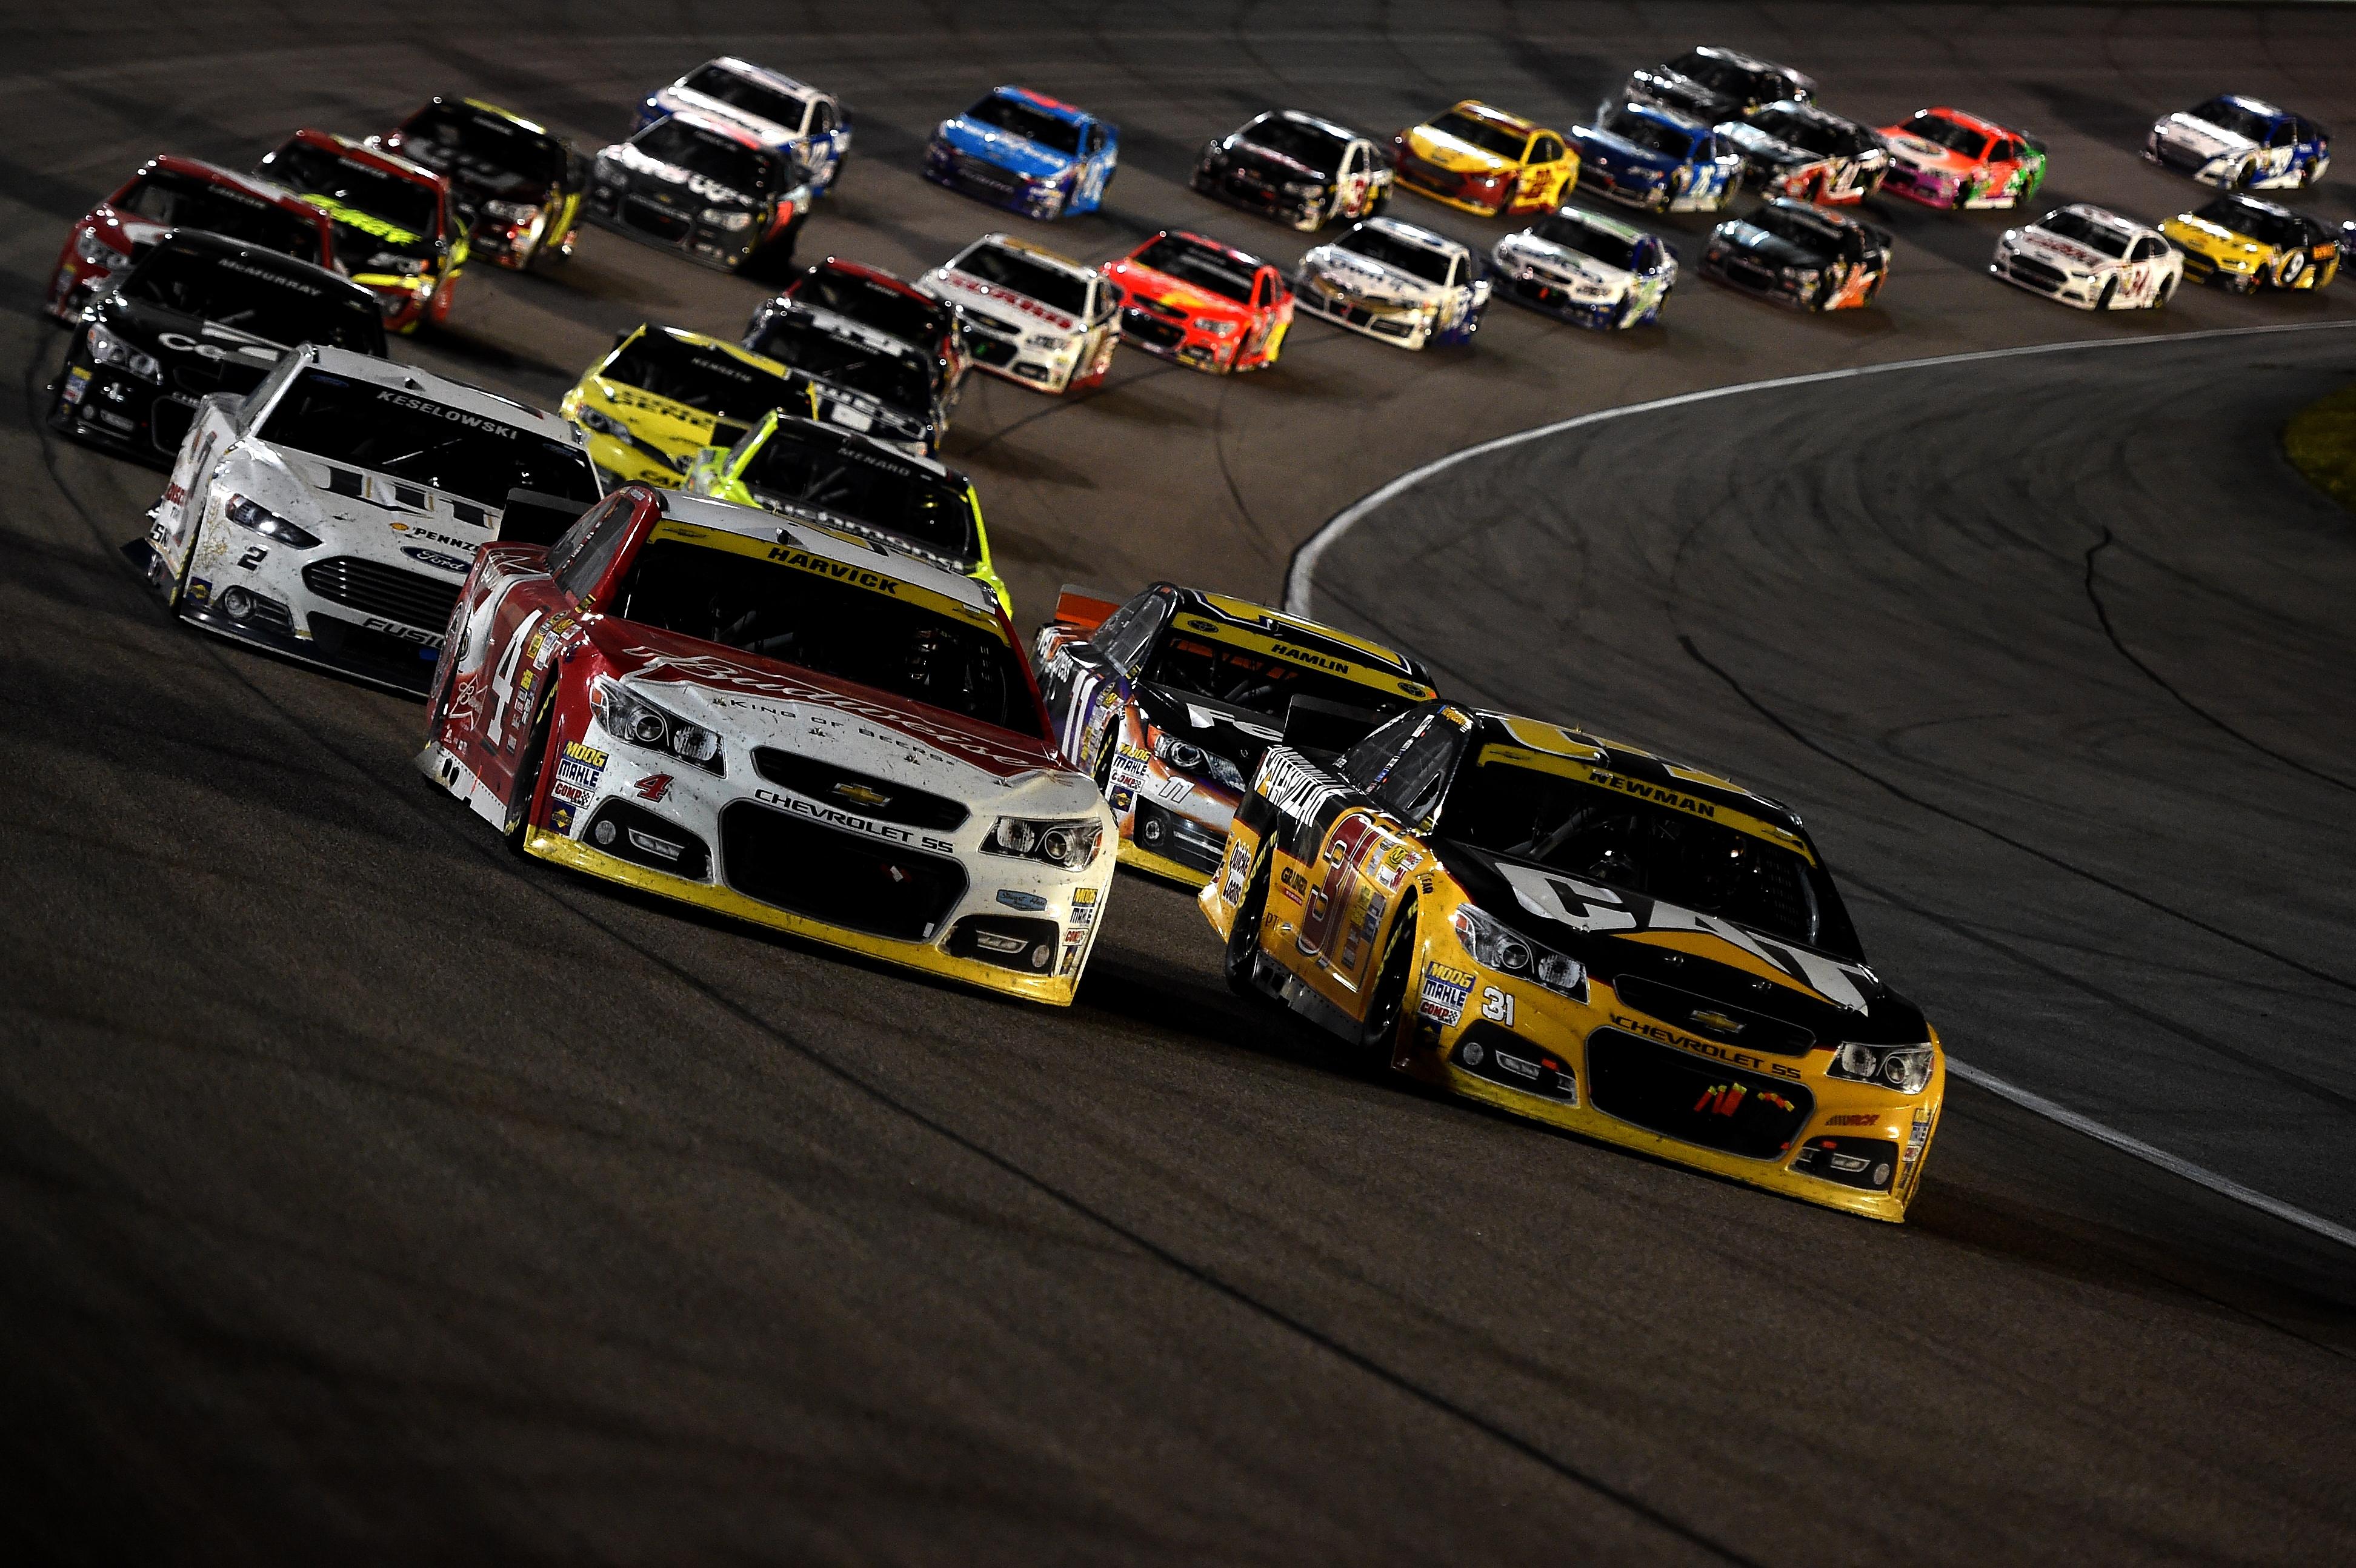 Hearing Loss and NASCAR Intrinsically Linked